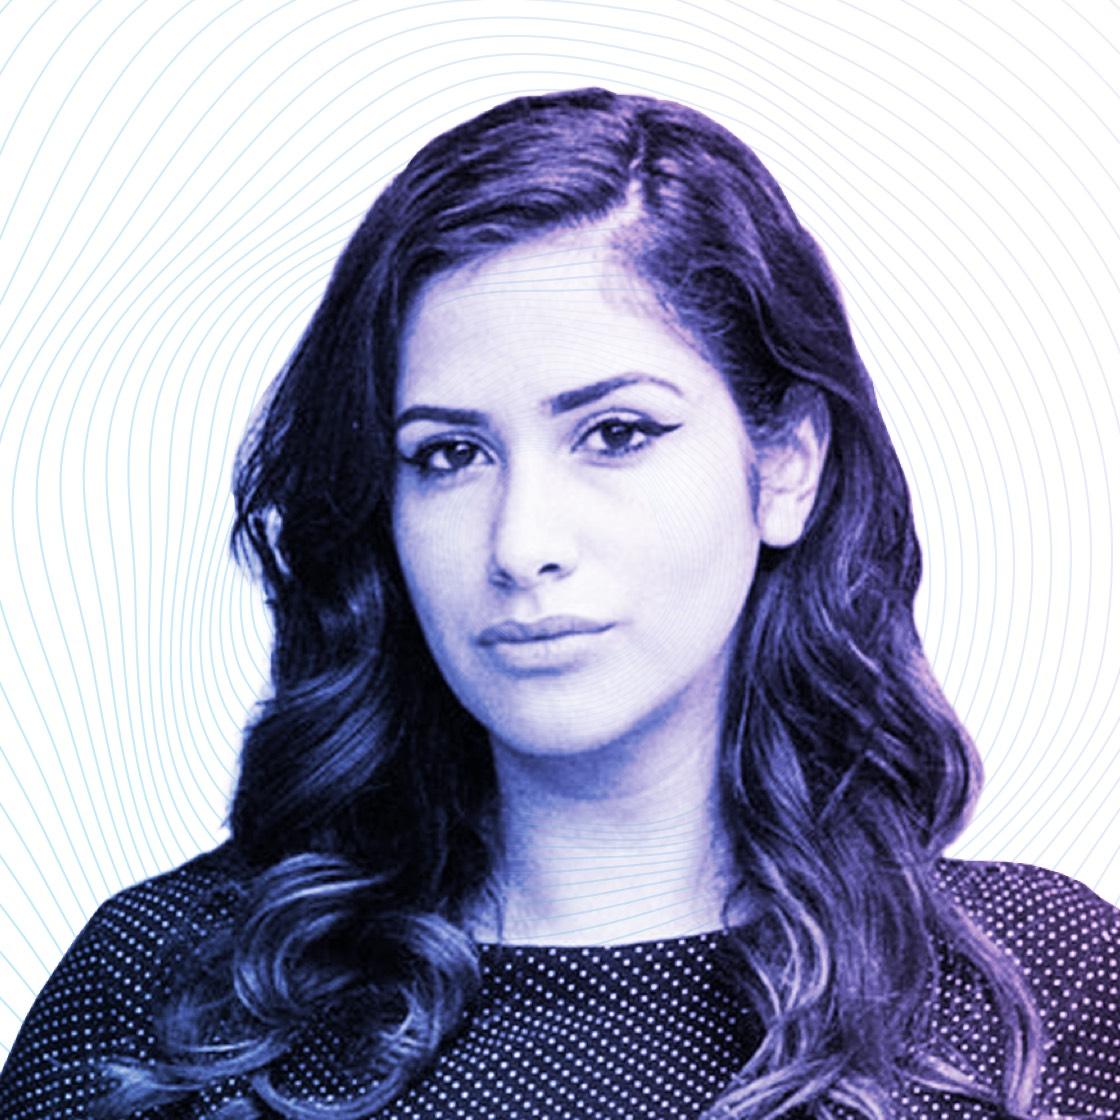 Yesenia Perez-Cruz